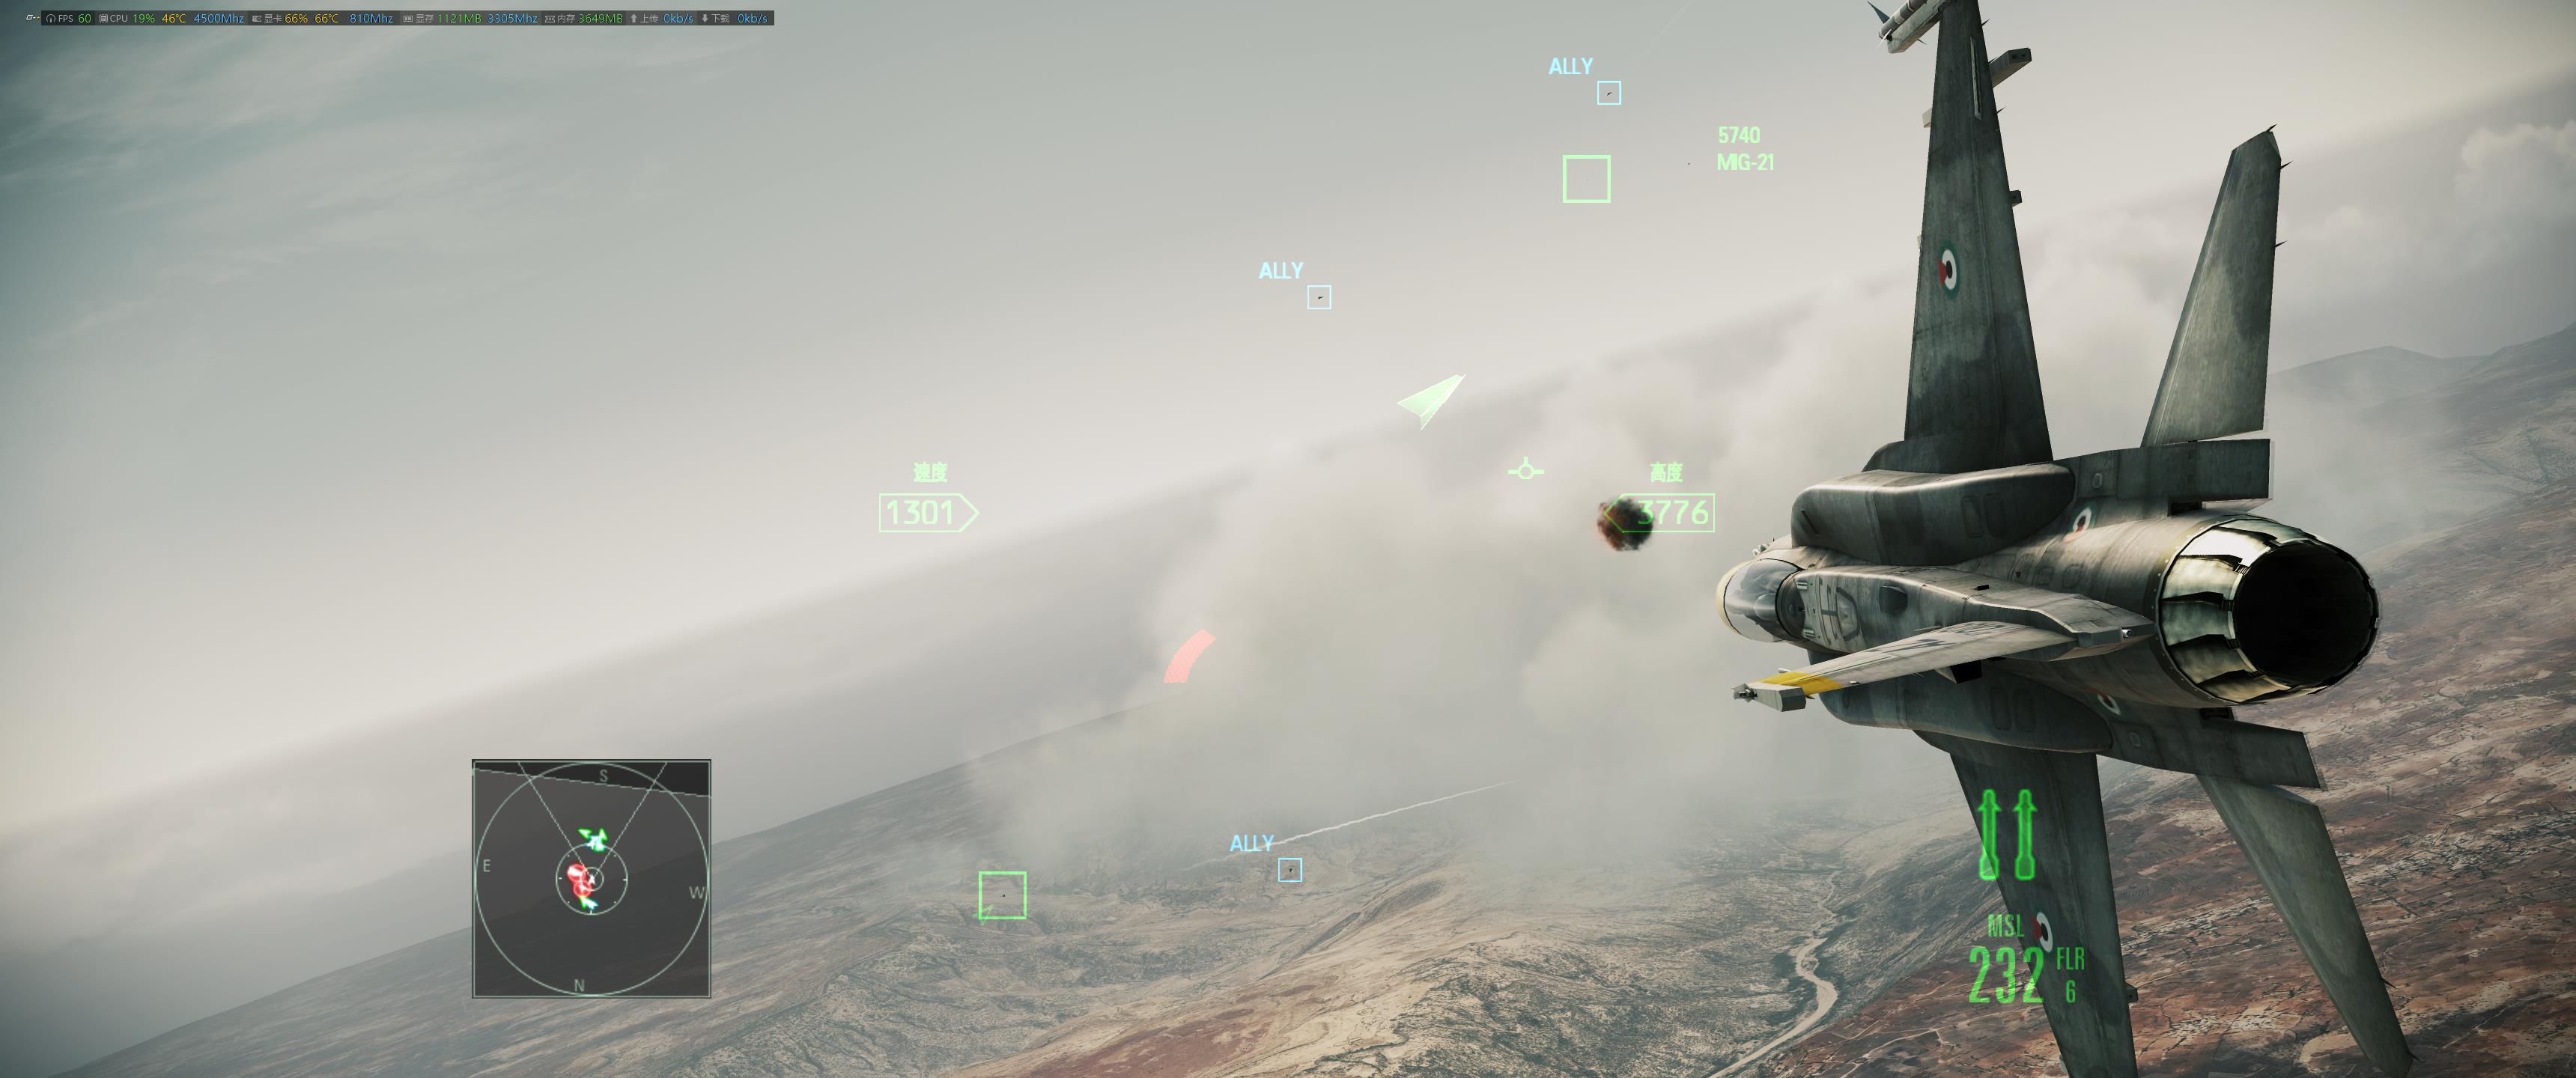 Ace Combat_AH-05-23-13-37.jpg